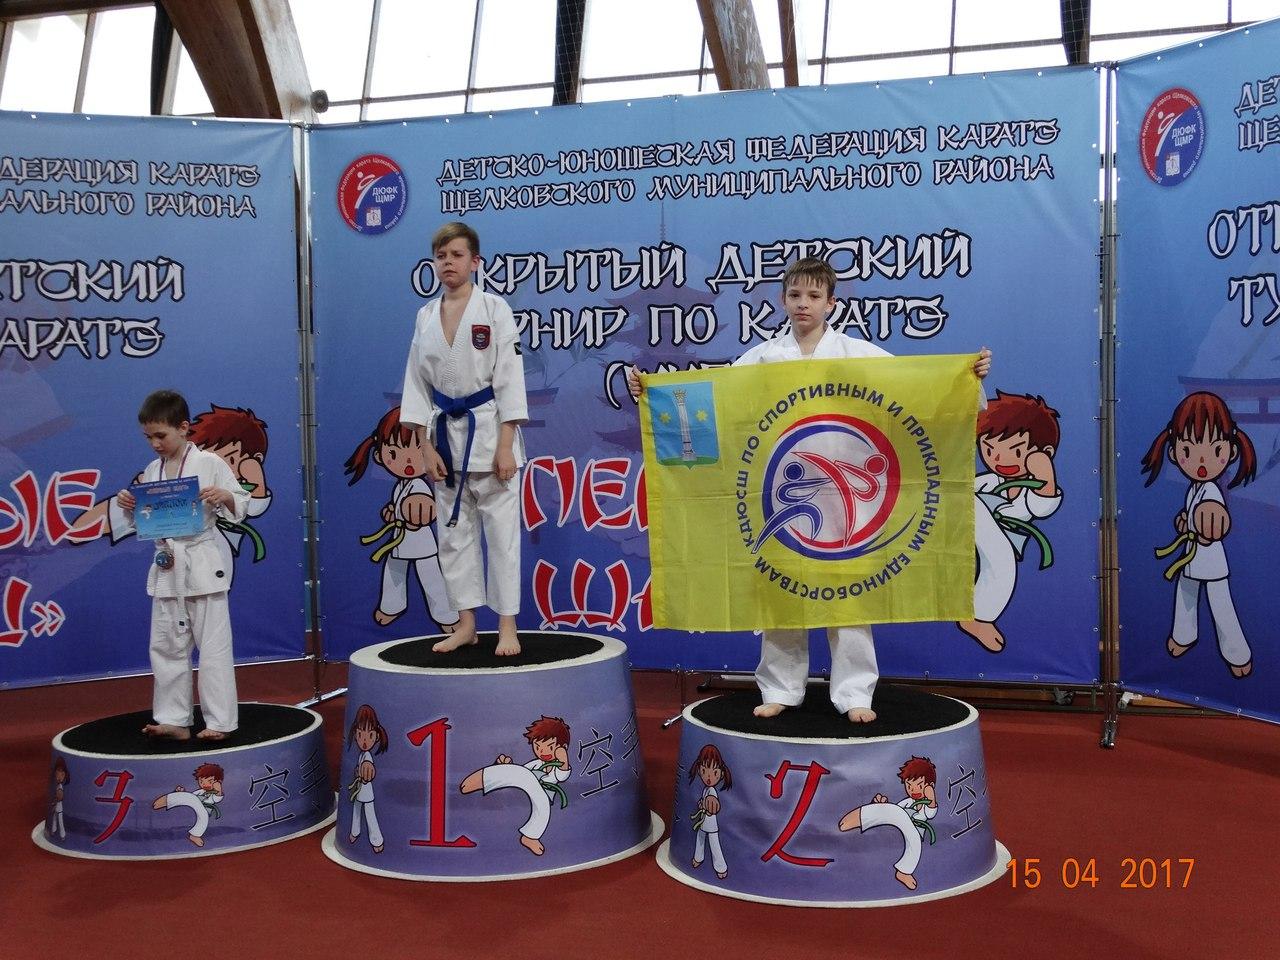 Золото, два серебра и три бронзы на Турнире по каратэ Первые шаги, фото Коломна Спорт